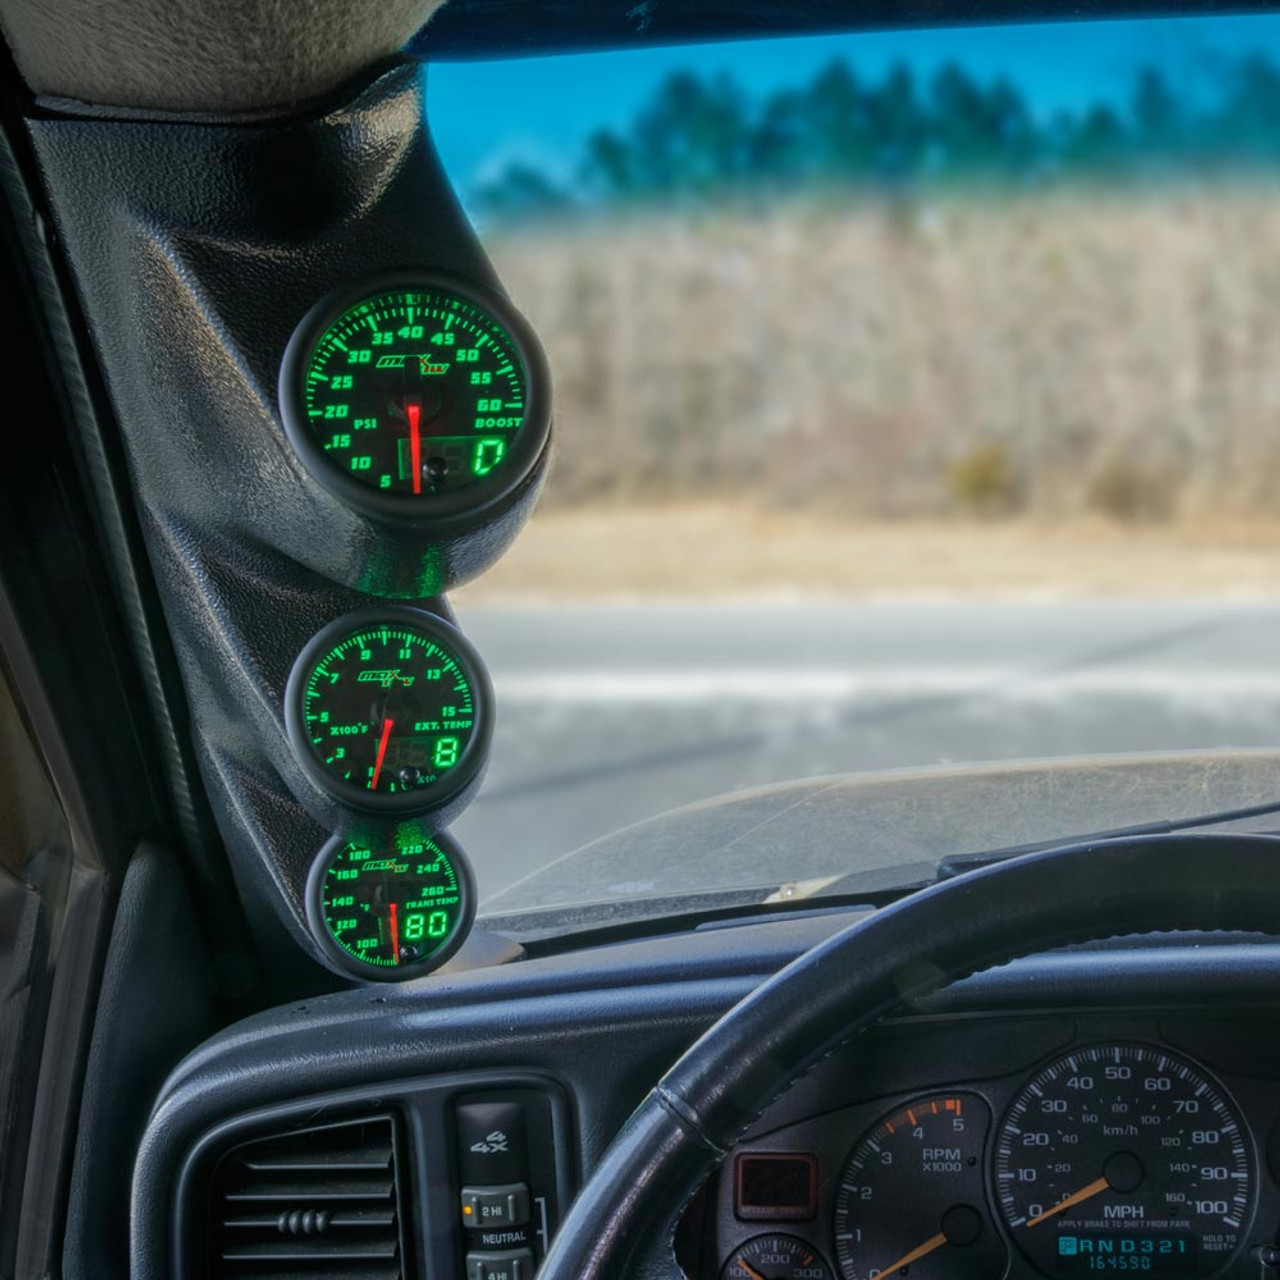 00-06 Chevrolet Silverado Duramax MaxTow Custom Gauge Package | Chevrolet Silverado Lmm Fuel Gauge Wiring |  | MaxTow Gauges